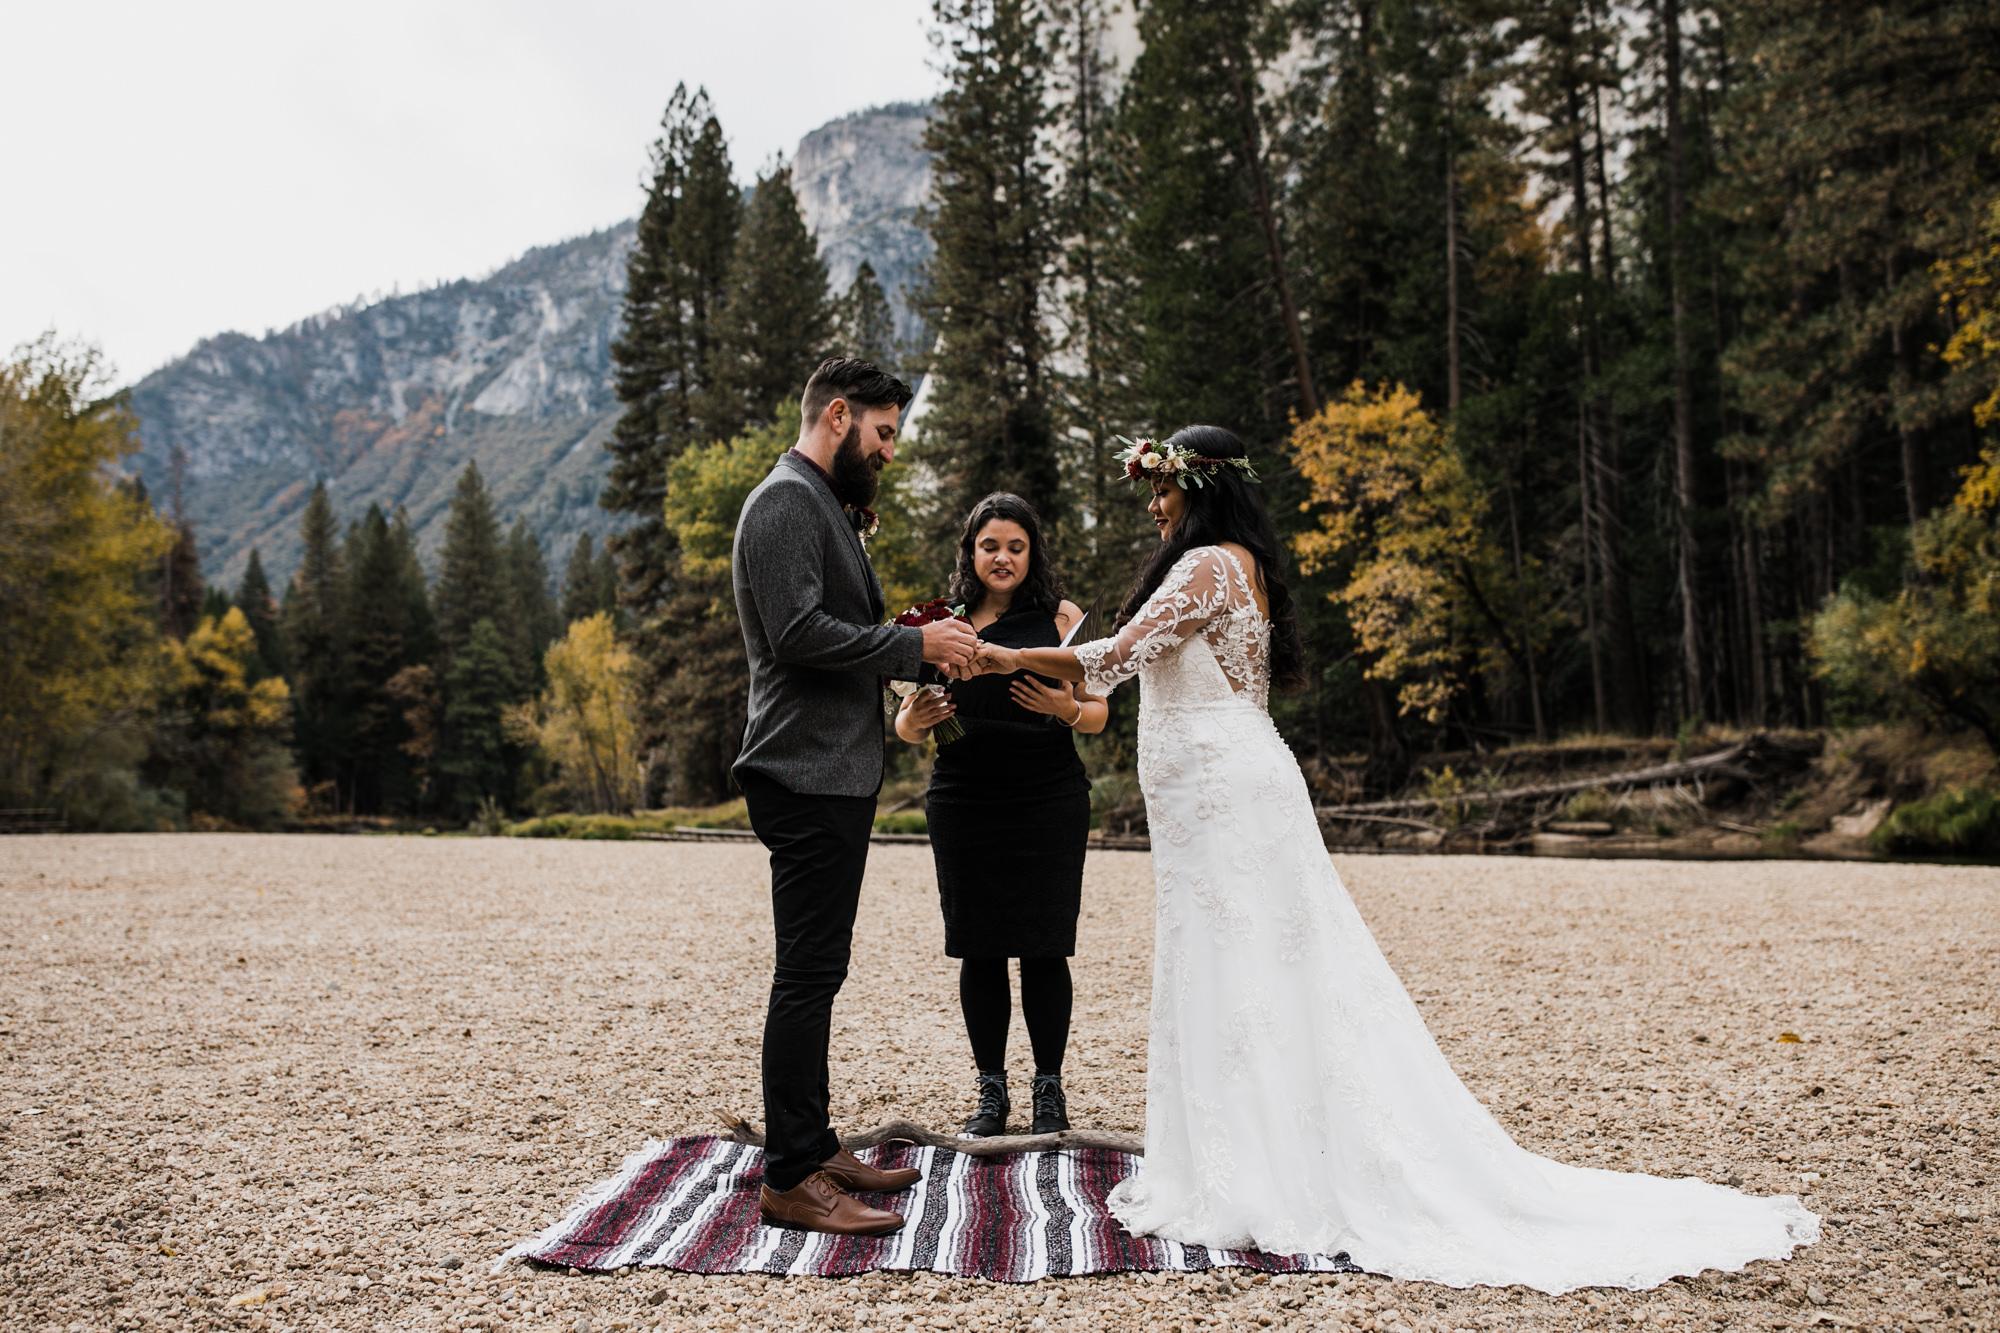 intimate wedding day in yosemite valley | destination adventure wedding photographers | the hearnes adventure photography | www.thehearnes.com